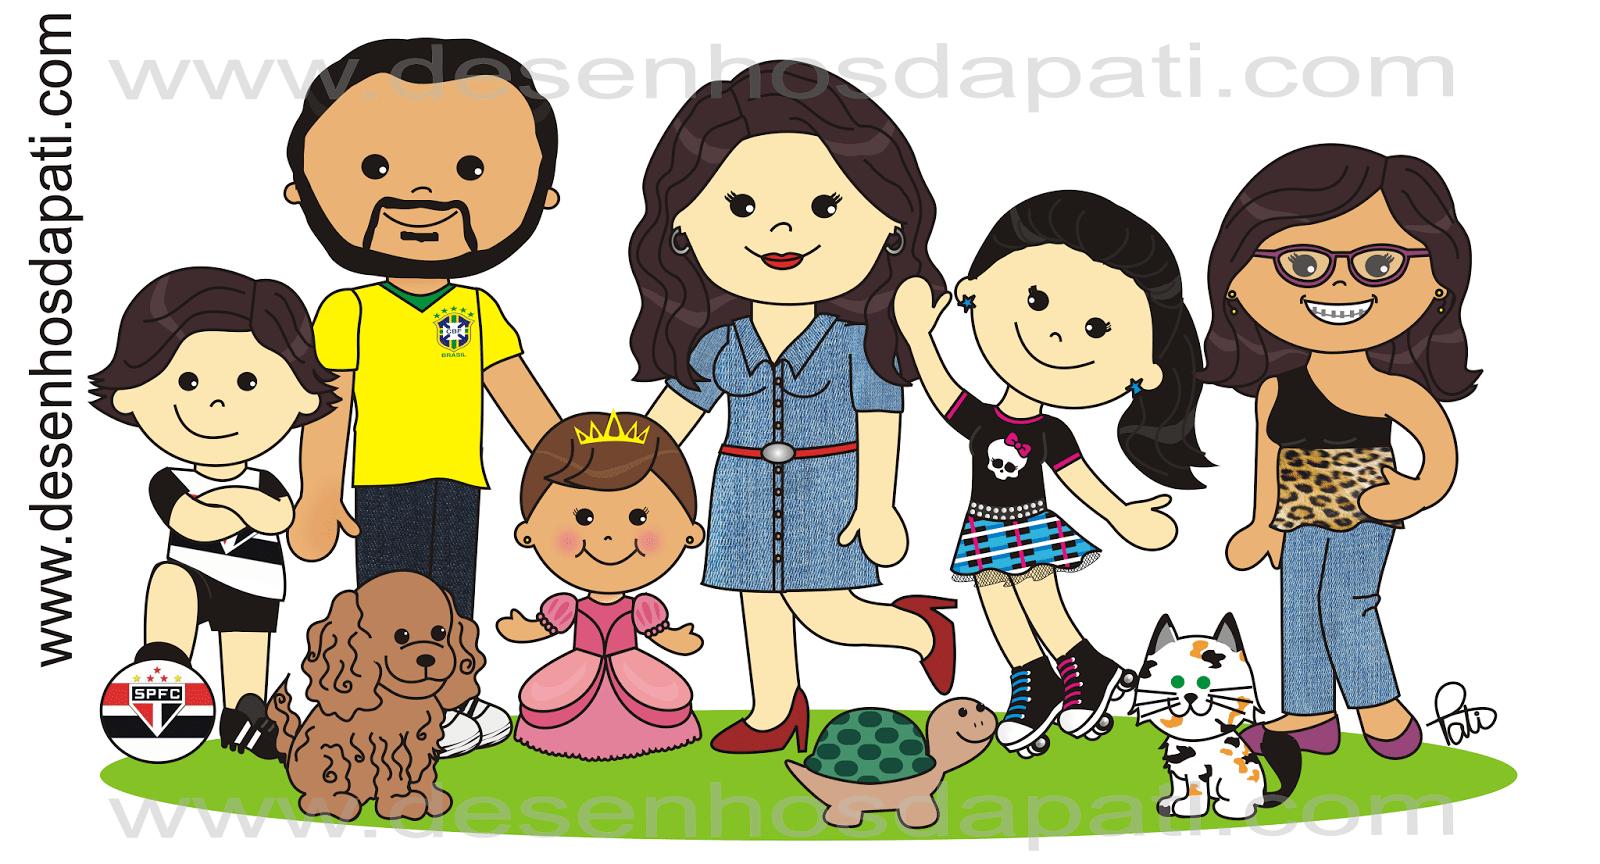 Desenhos Da Pati  Desenho De Família Carikinha  3